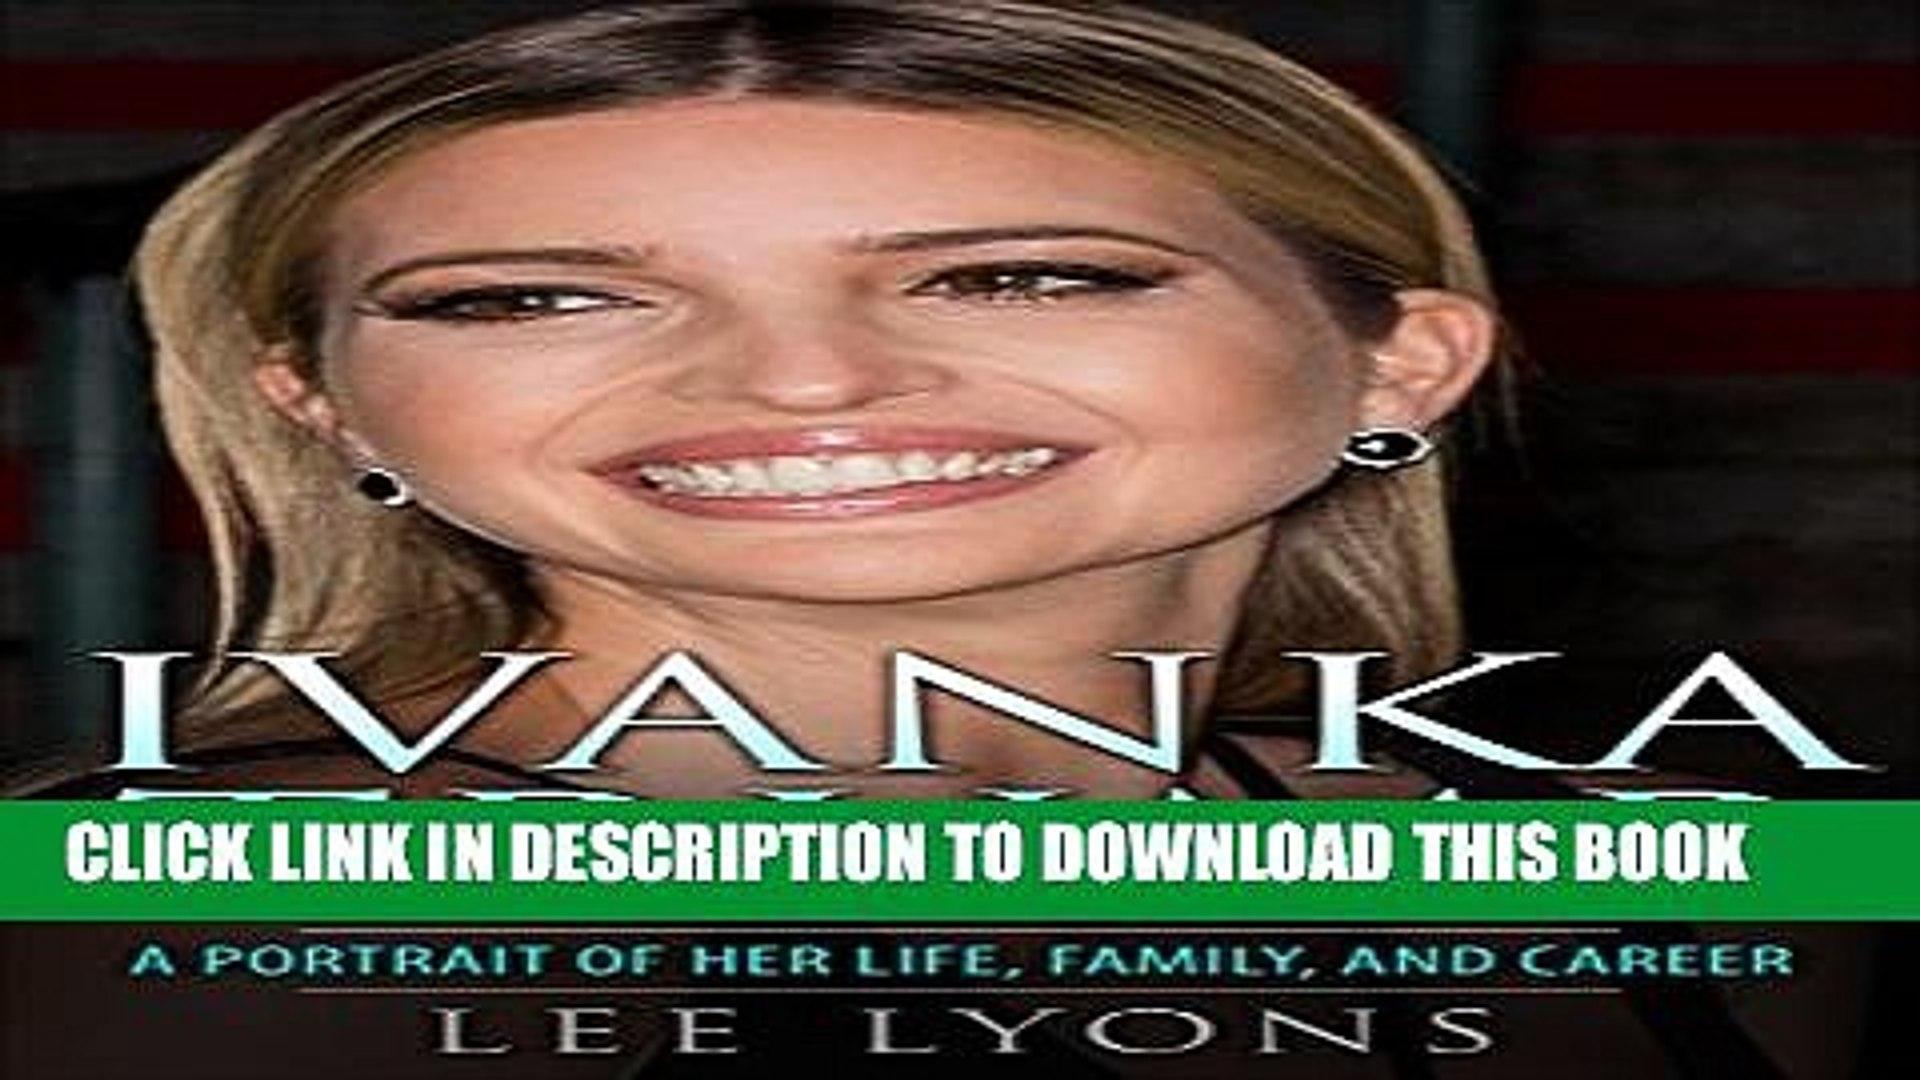 [PDF] Ivanka Trump: A Revealing Portrait of Her Life, Family, and Career (Donald Trump, Trump